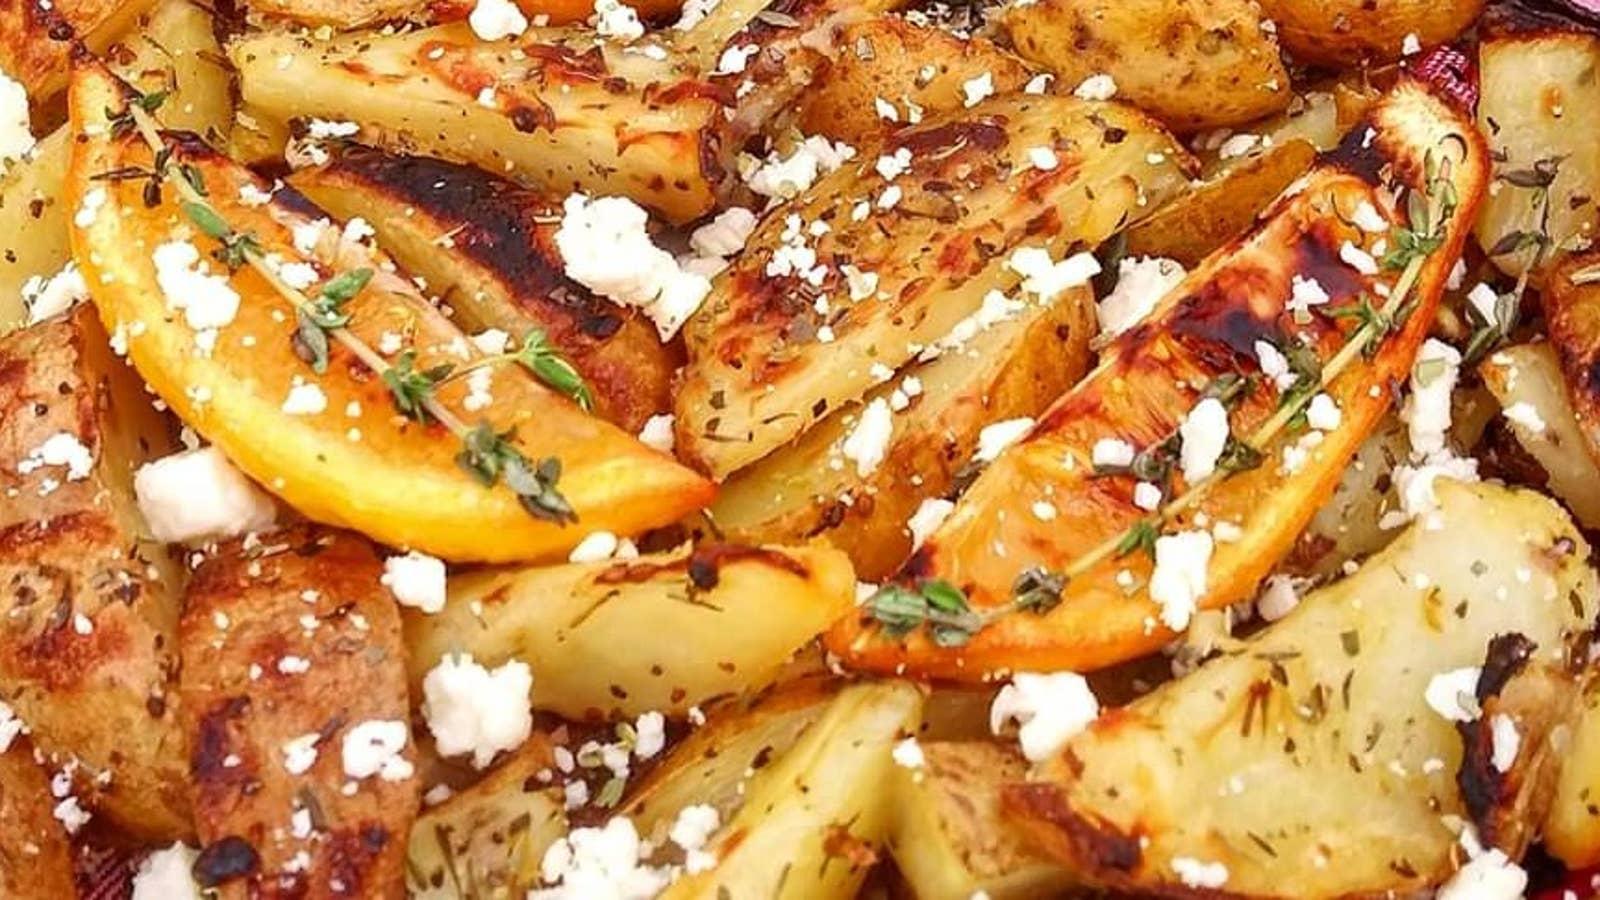 Oven-Roasted Greek Potatoes With Roasted Lemon Wedges